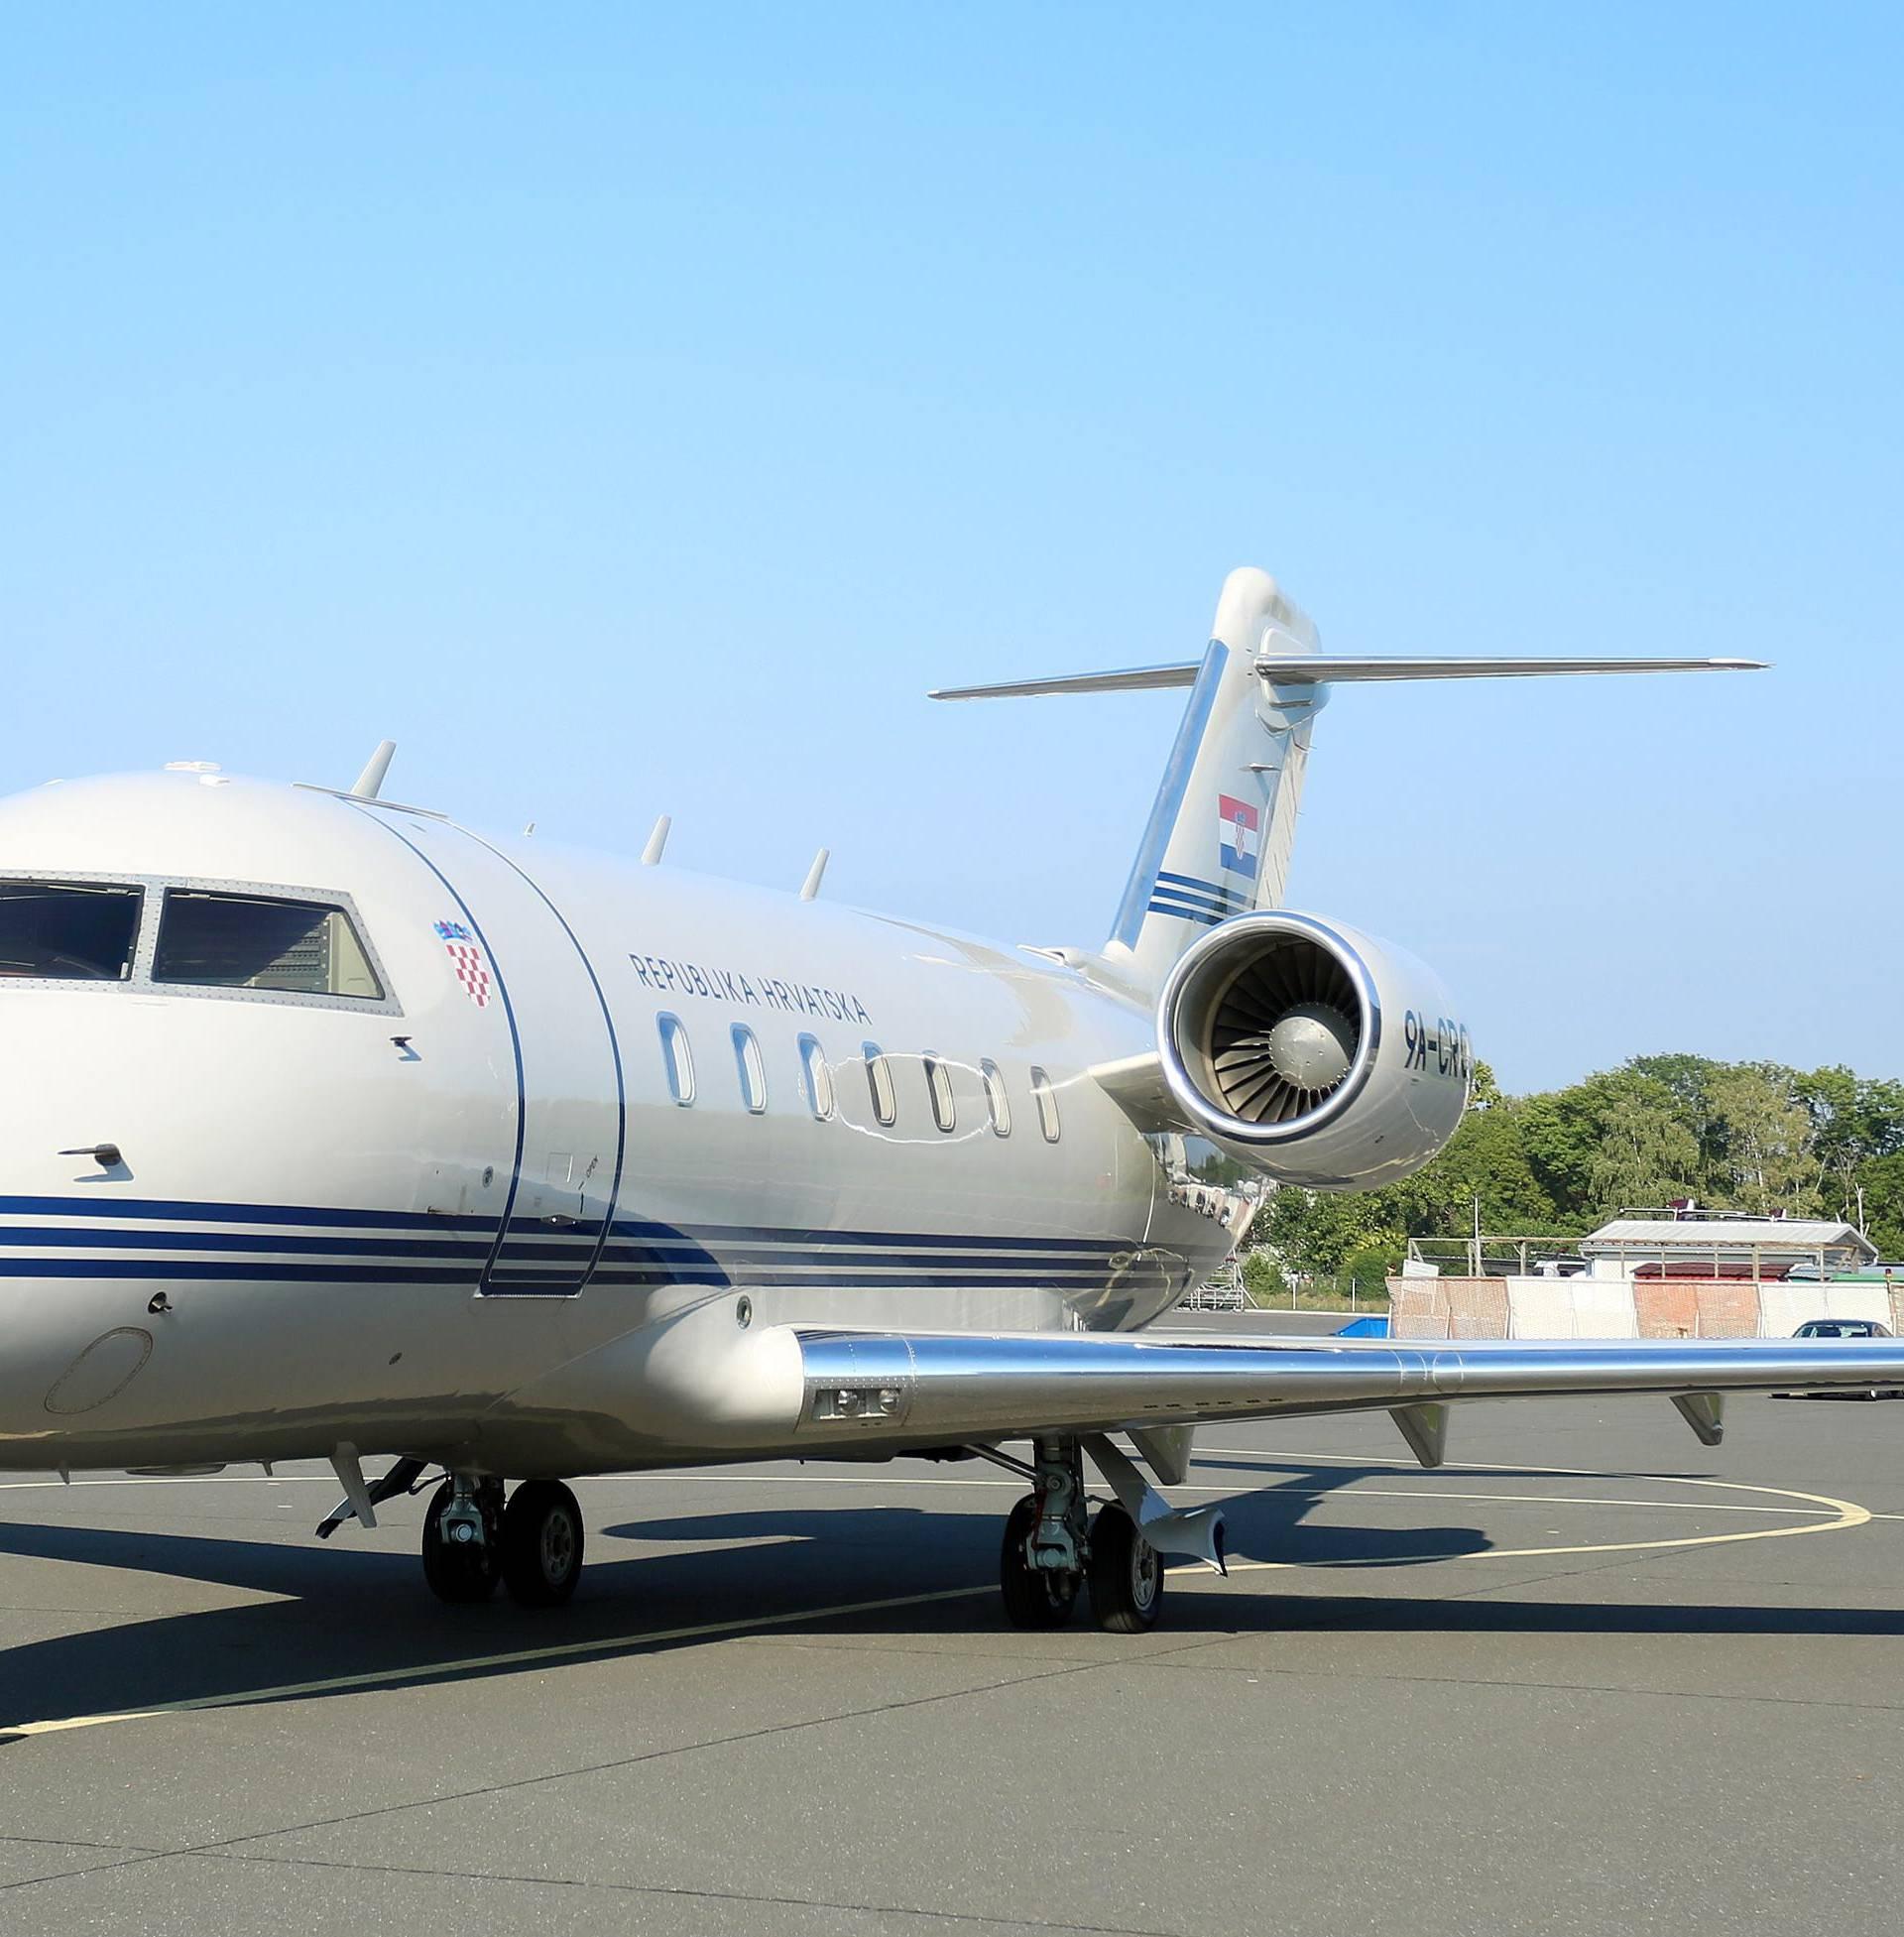 Vladin avion koriste kao taxi: U njemu se letjelo i po frak u Beč